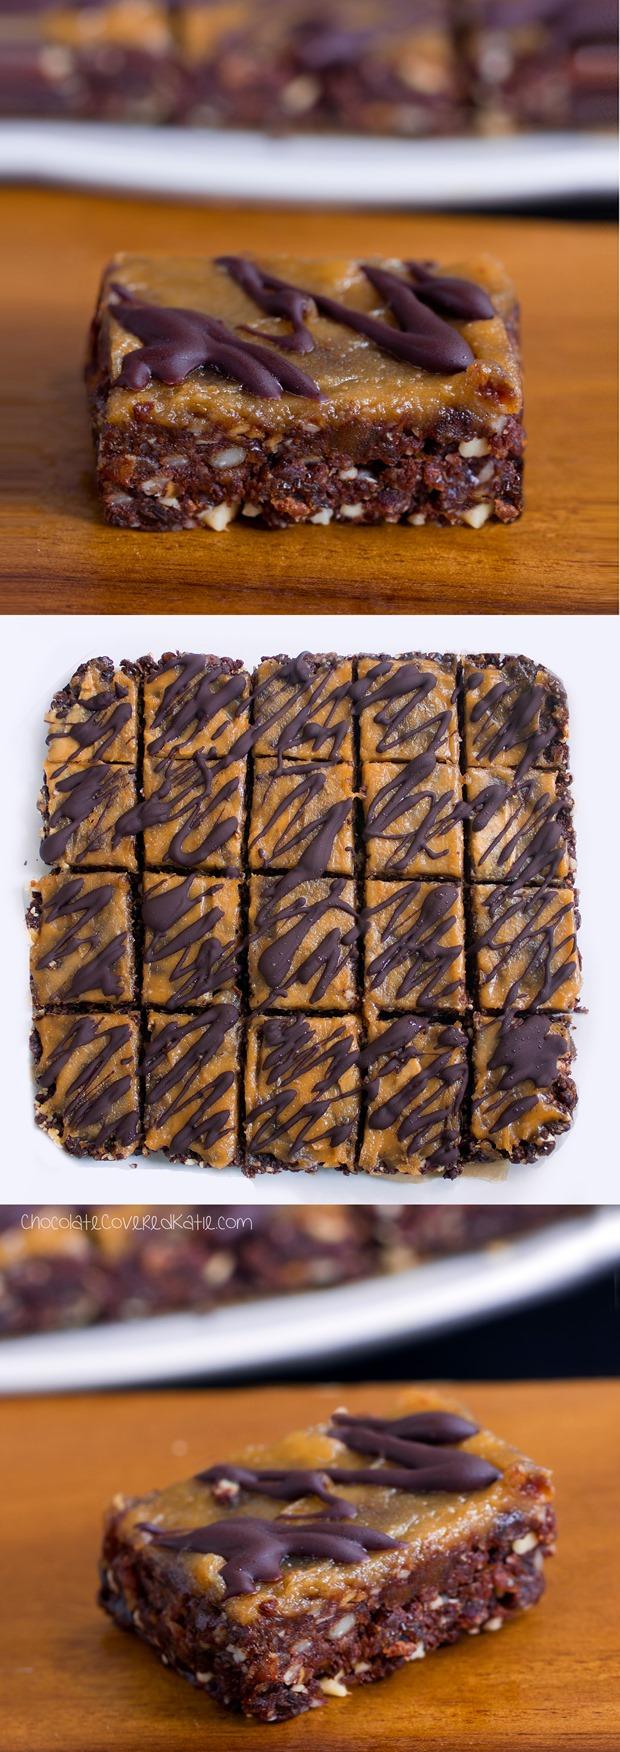 No Bake Chocolate Peanut Butter Brownie Bars